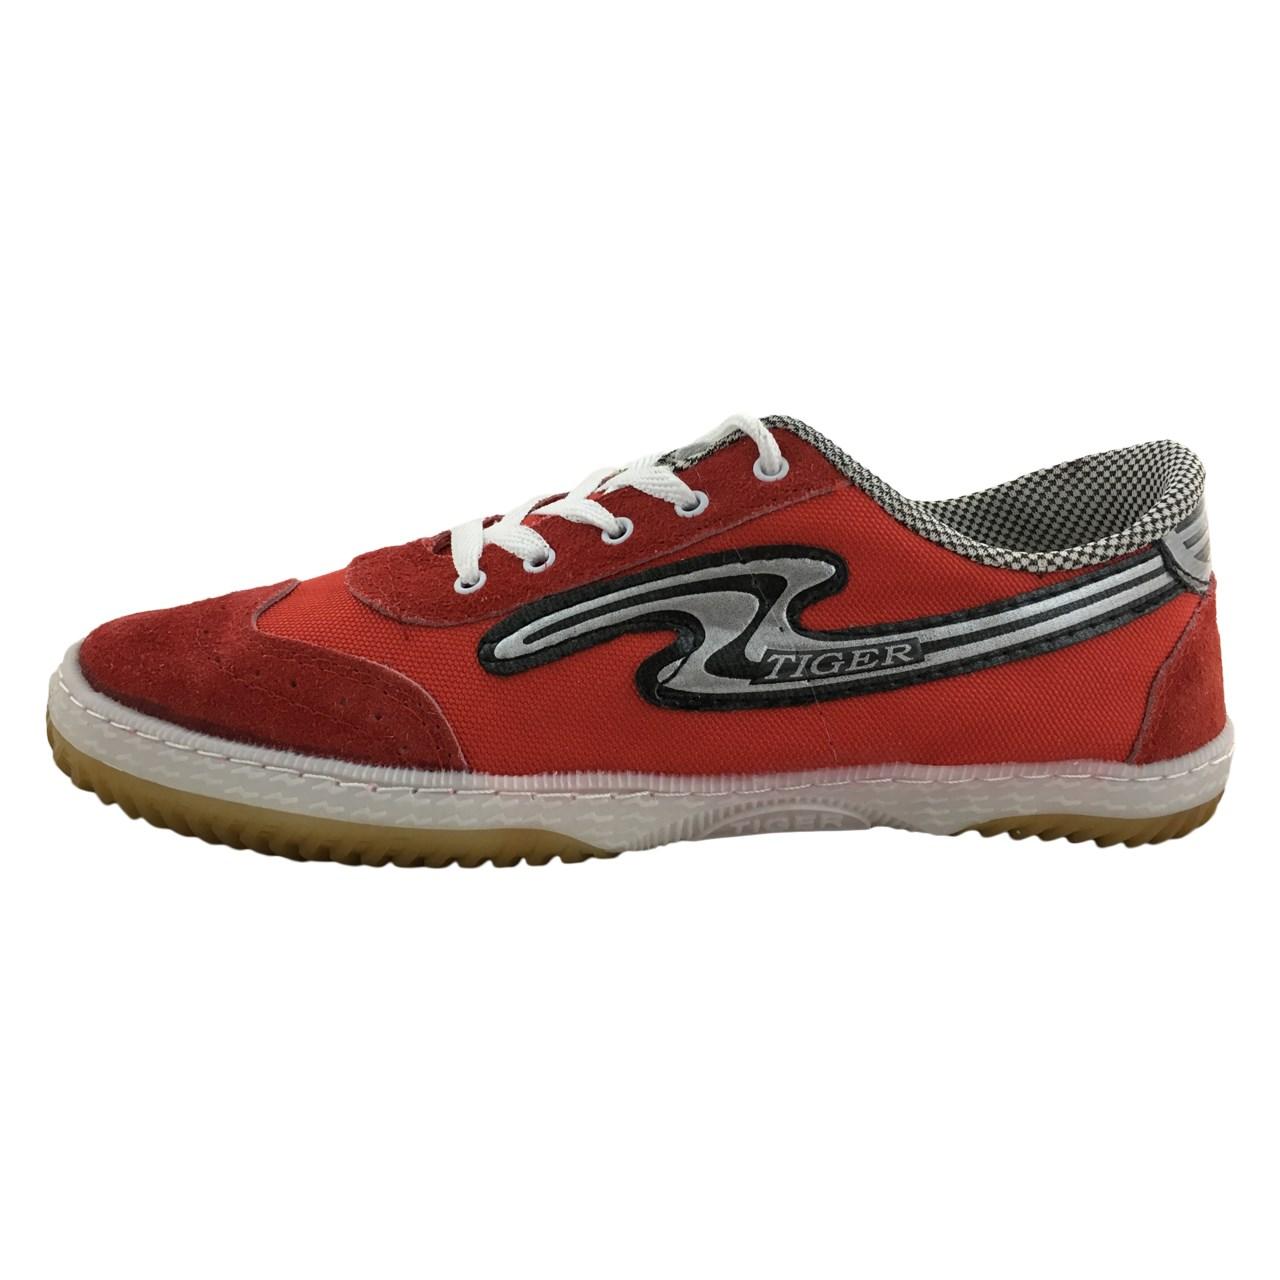 قیمت کفش فوتسال مردانه لیزری کد 1859